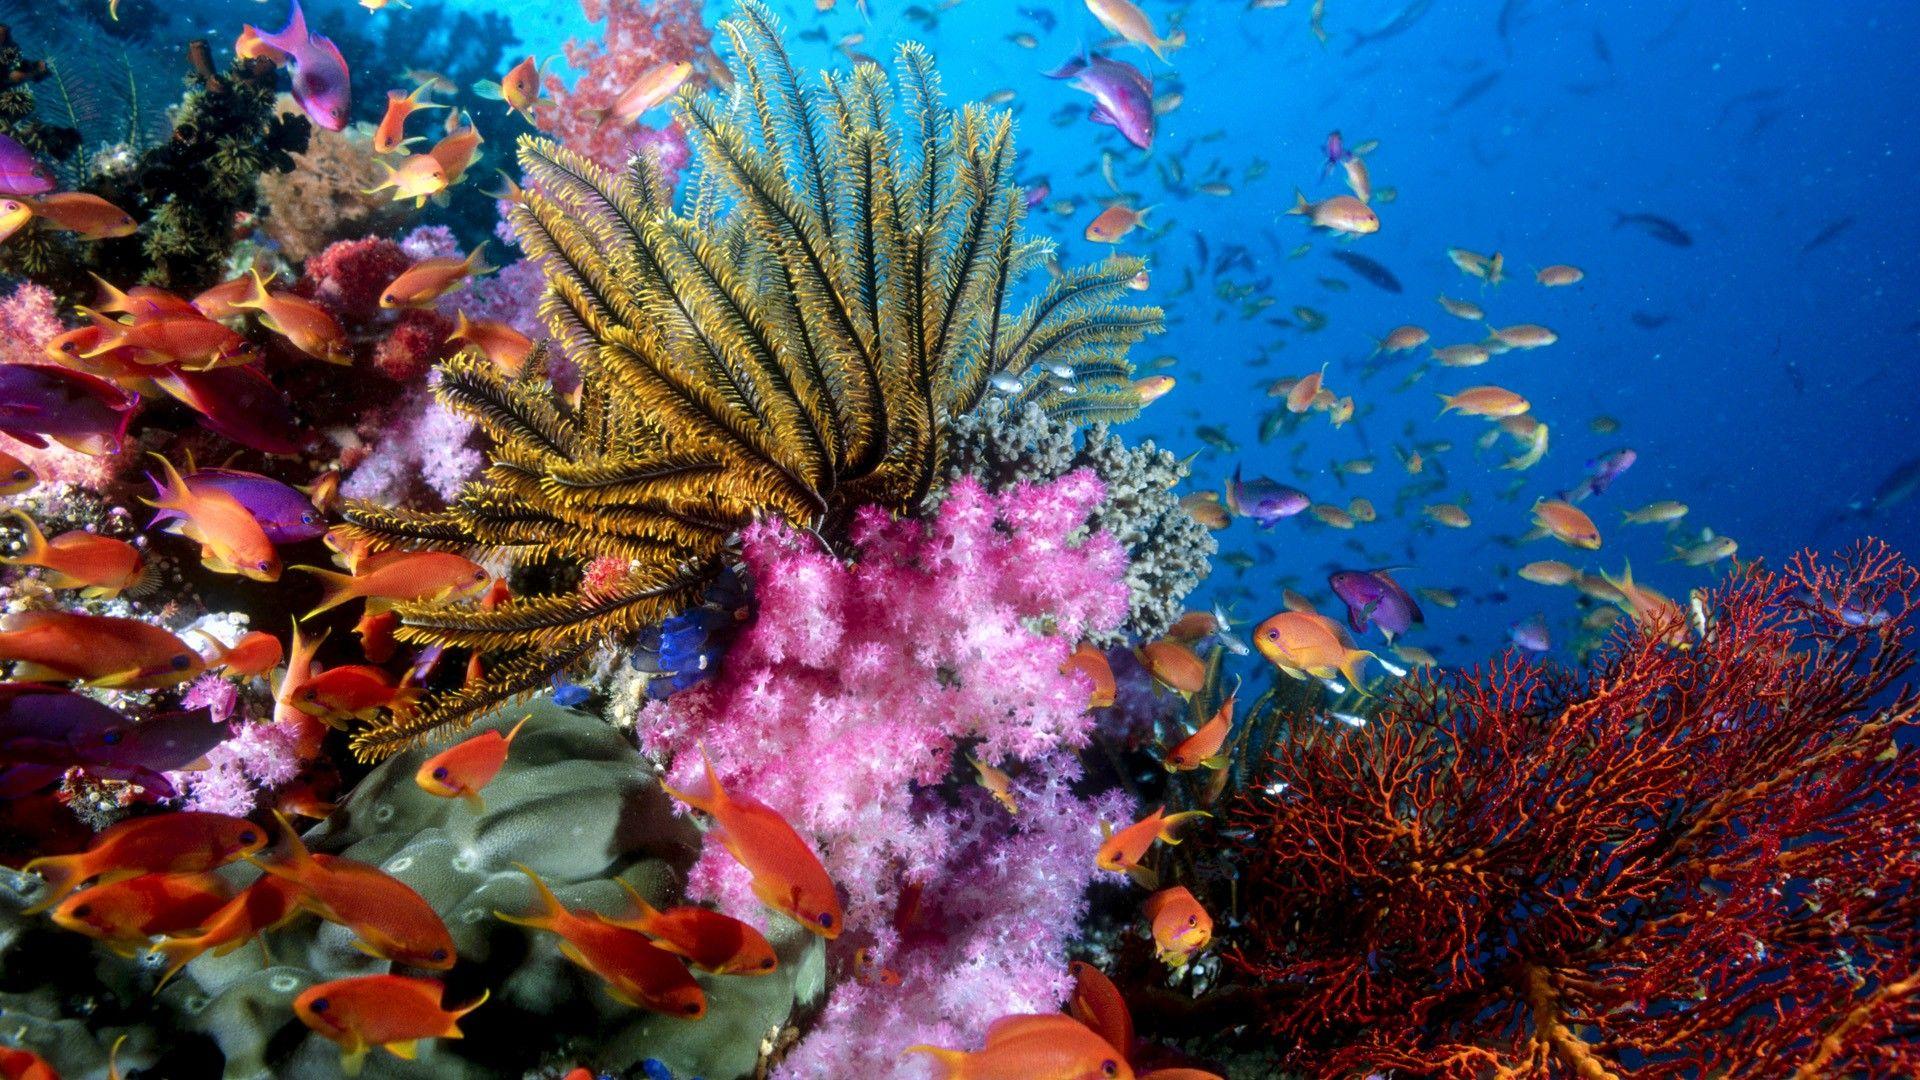 hawaii ocean underwater | underwater scene coral ocean wallpaper